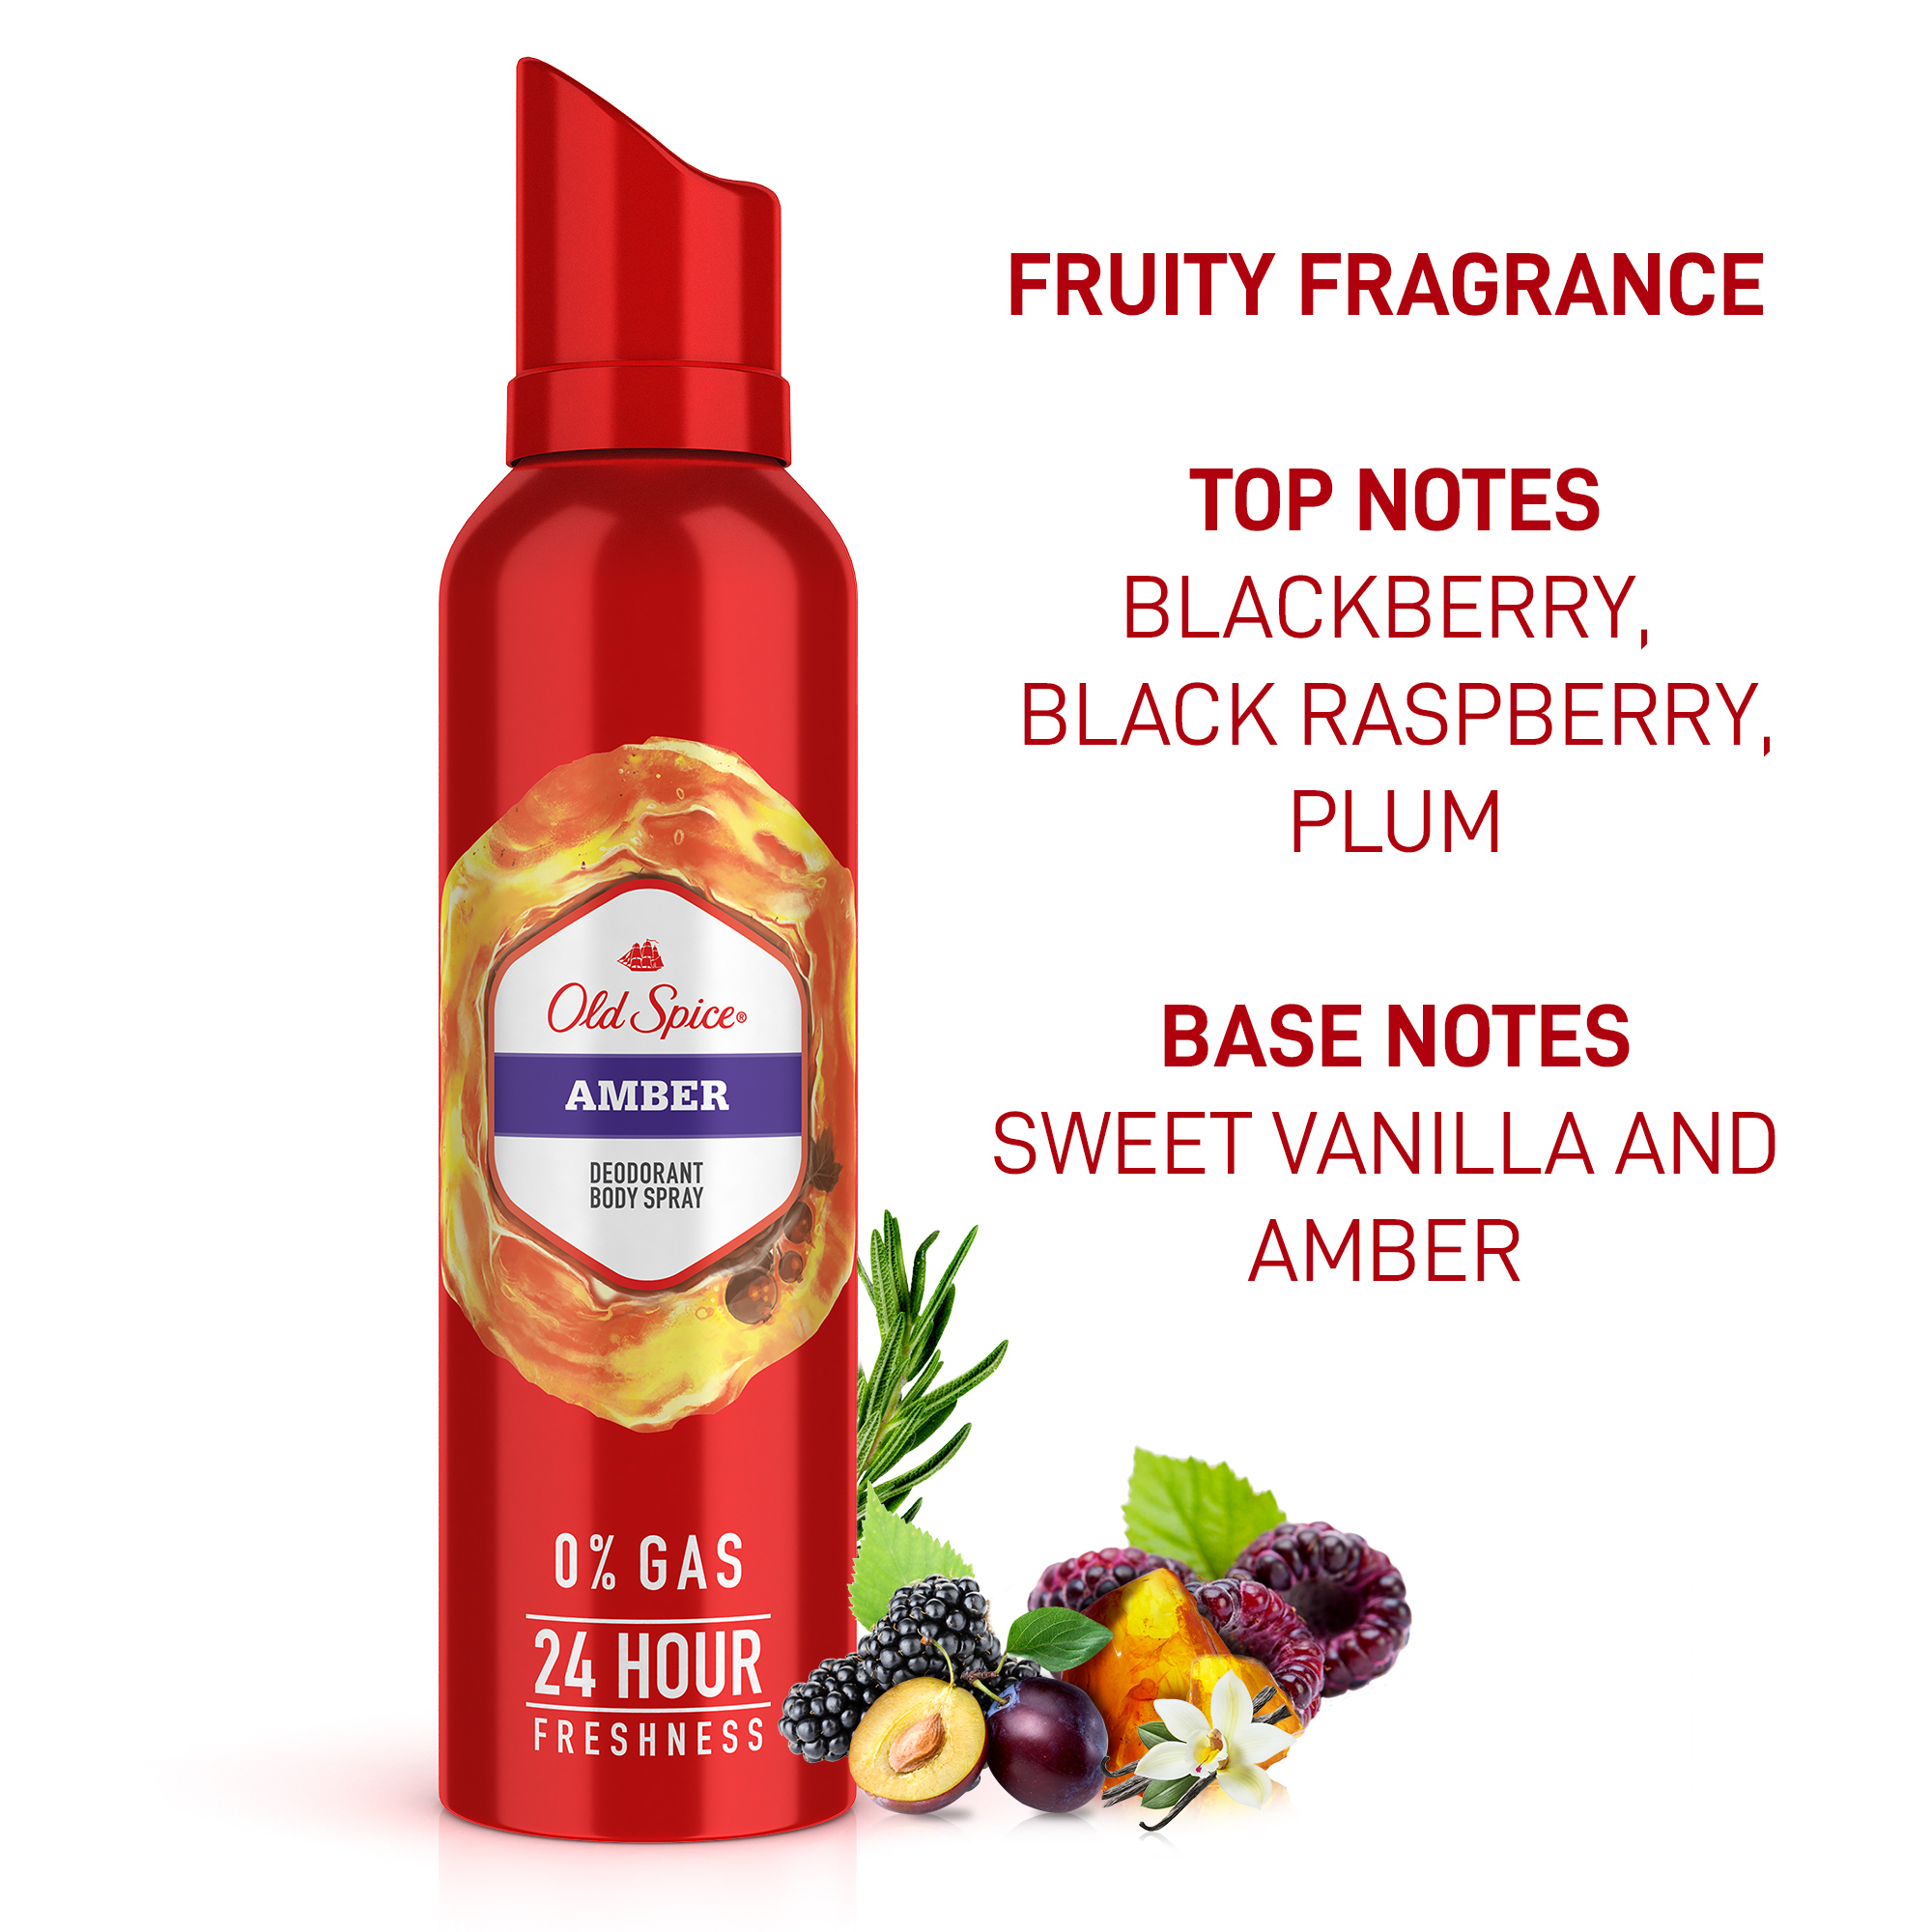 Old Spice Amber No Gas Deodorant Body Spray Perfume, 140 ml